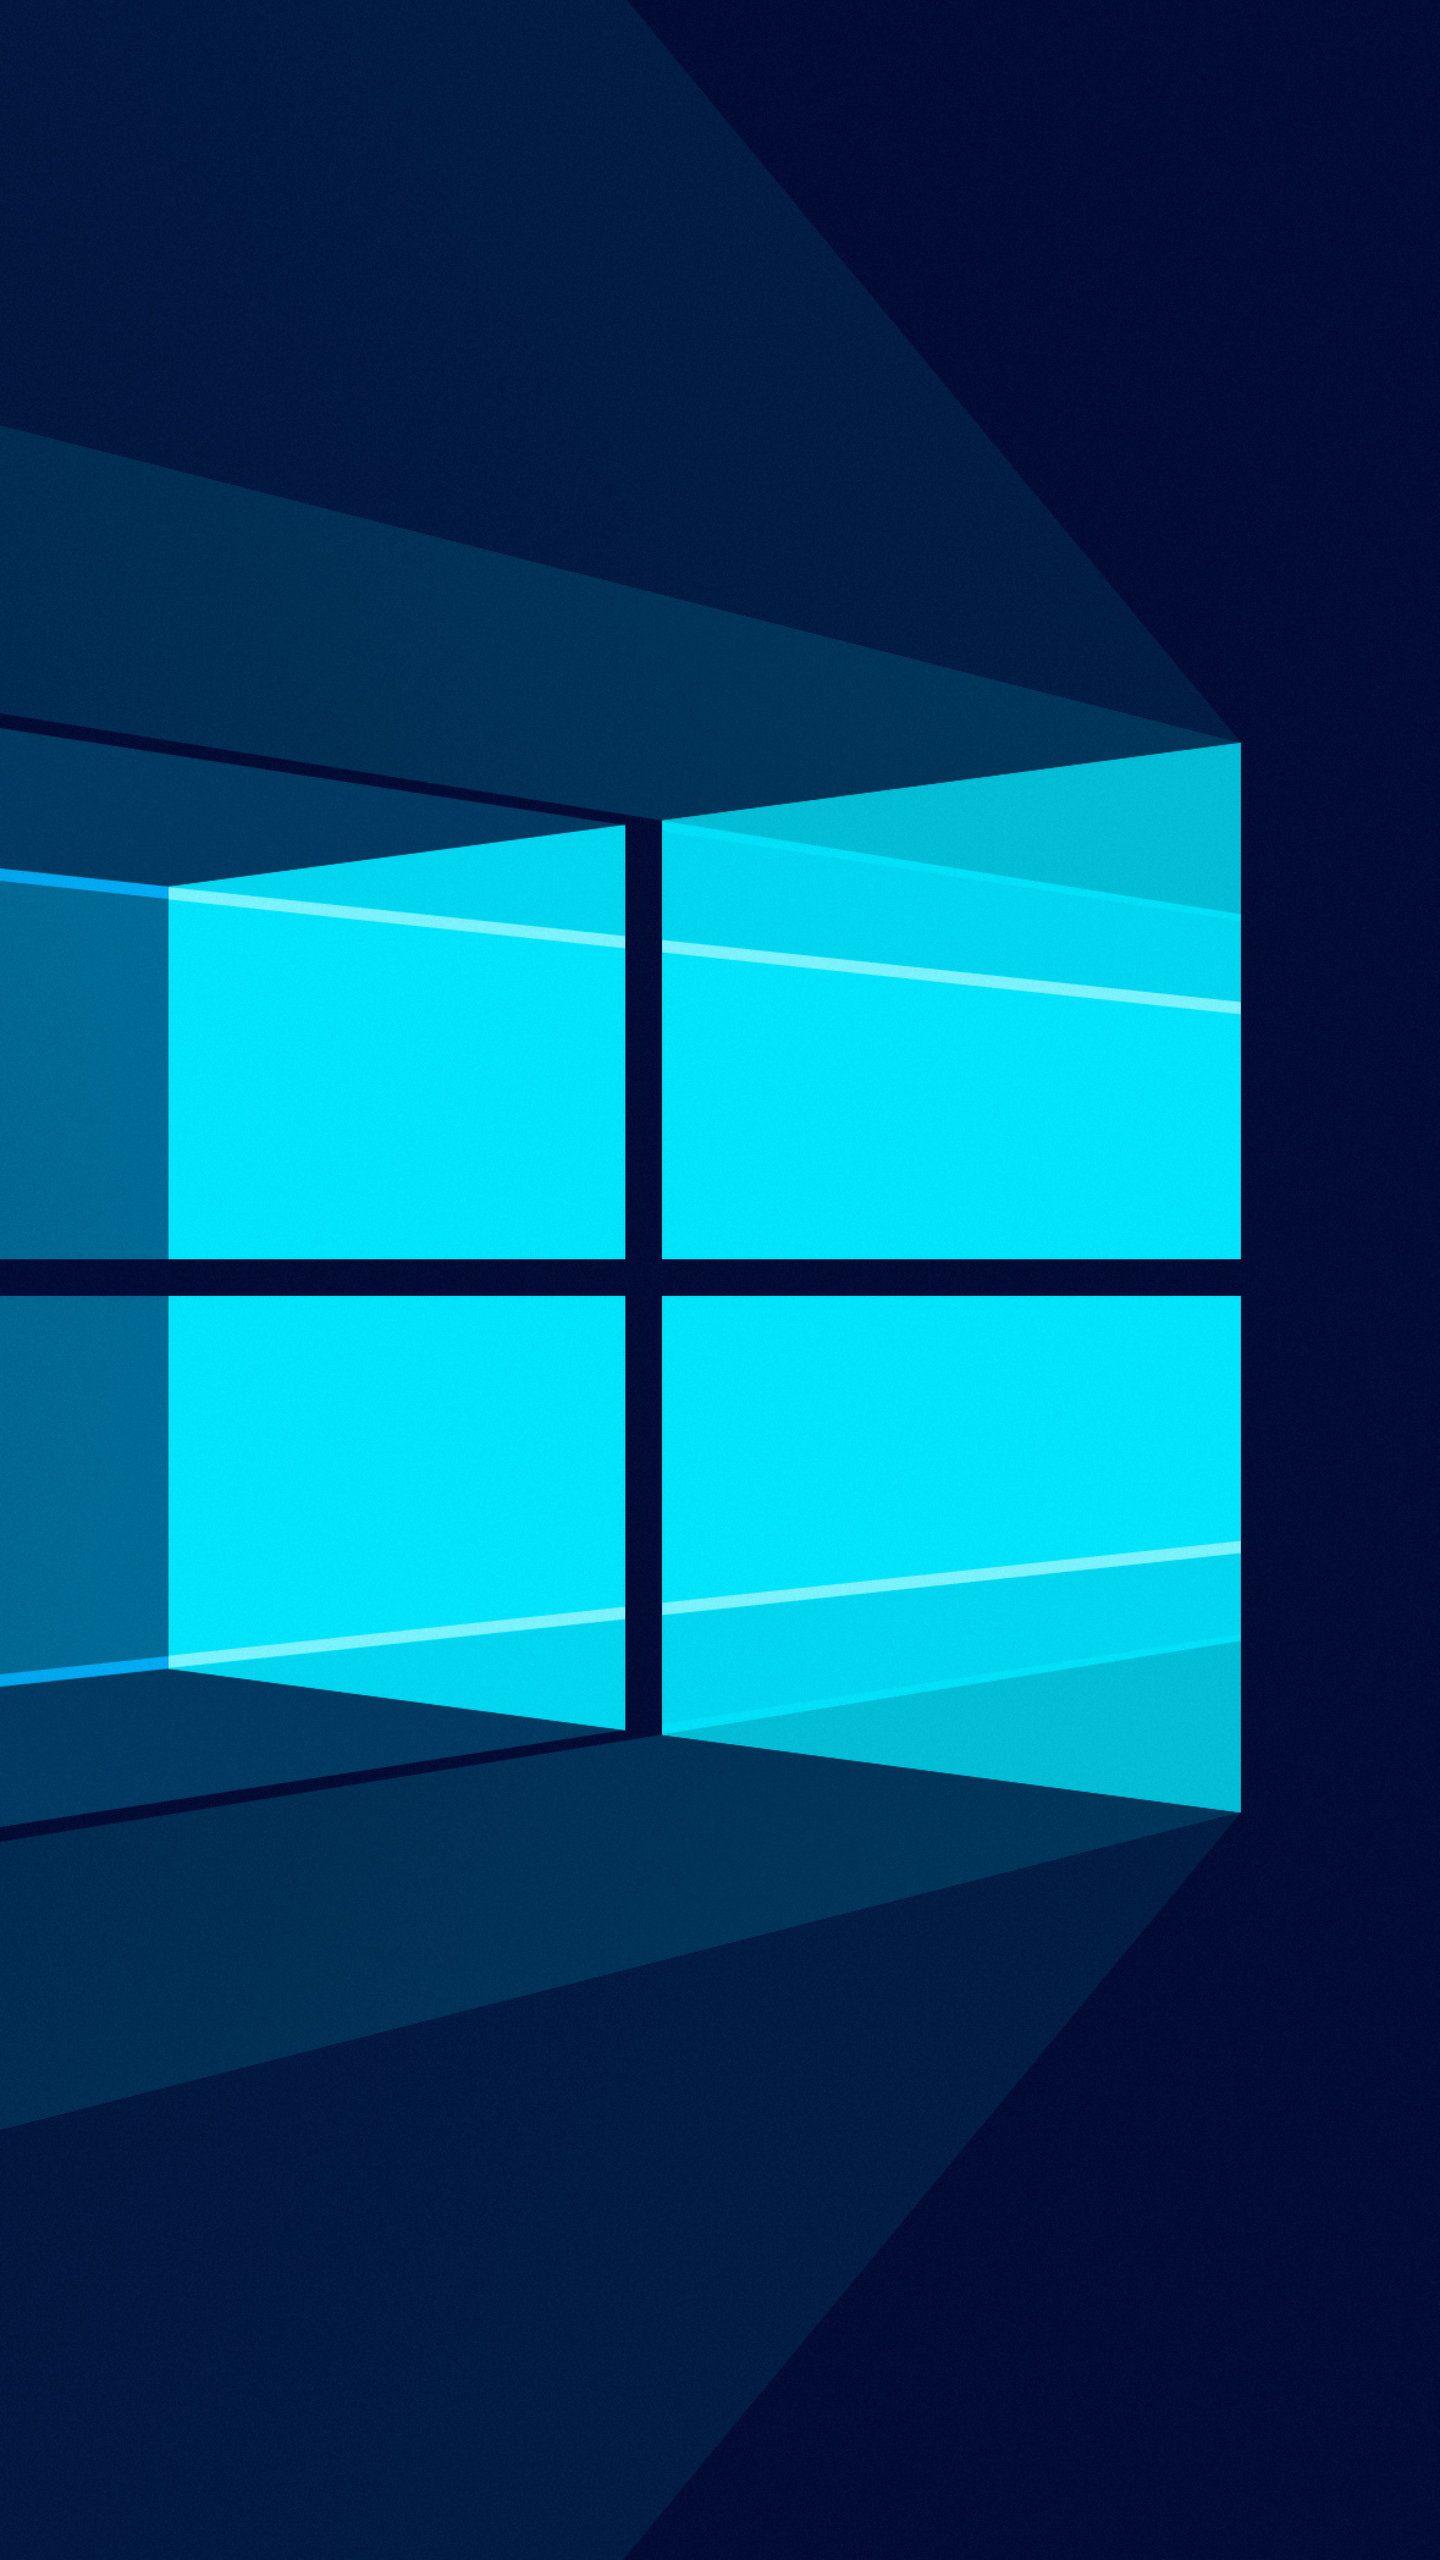 Windows 10 Minimalist Hd Computer Wallpapers Photos And Pictures Computer Wallpaper Minimalist Wallpaper Windows